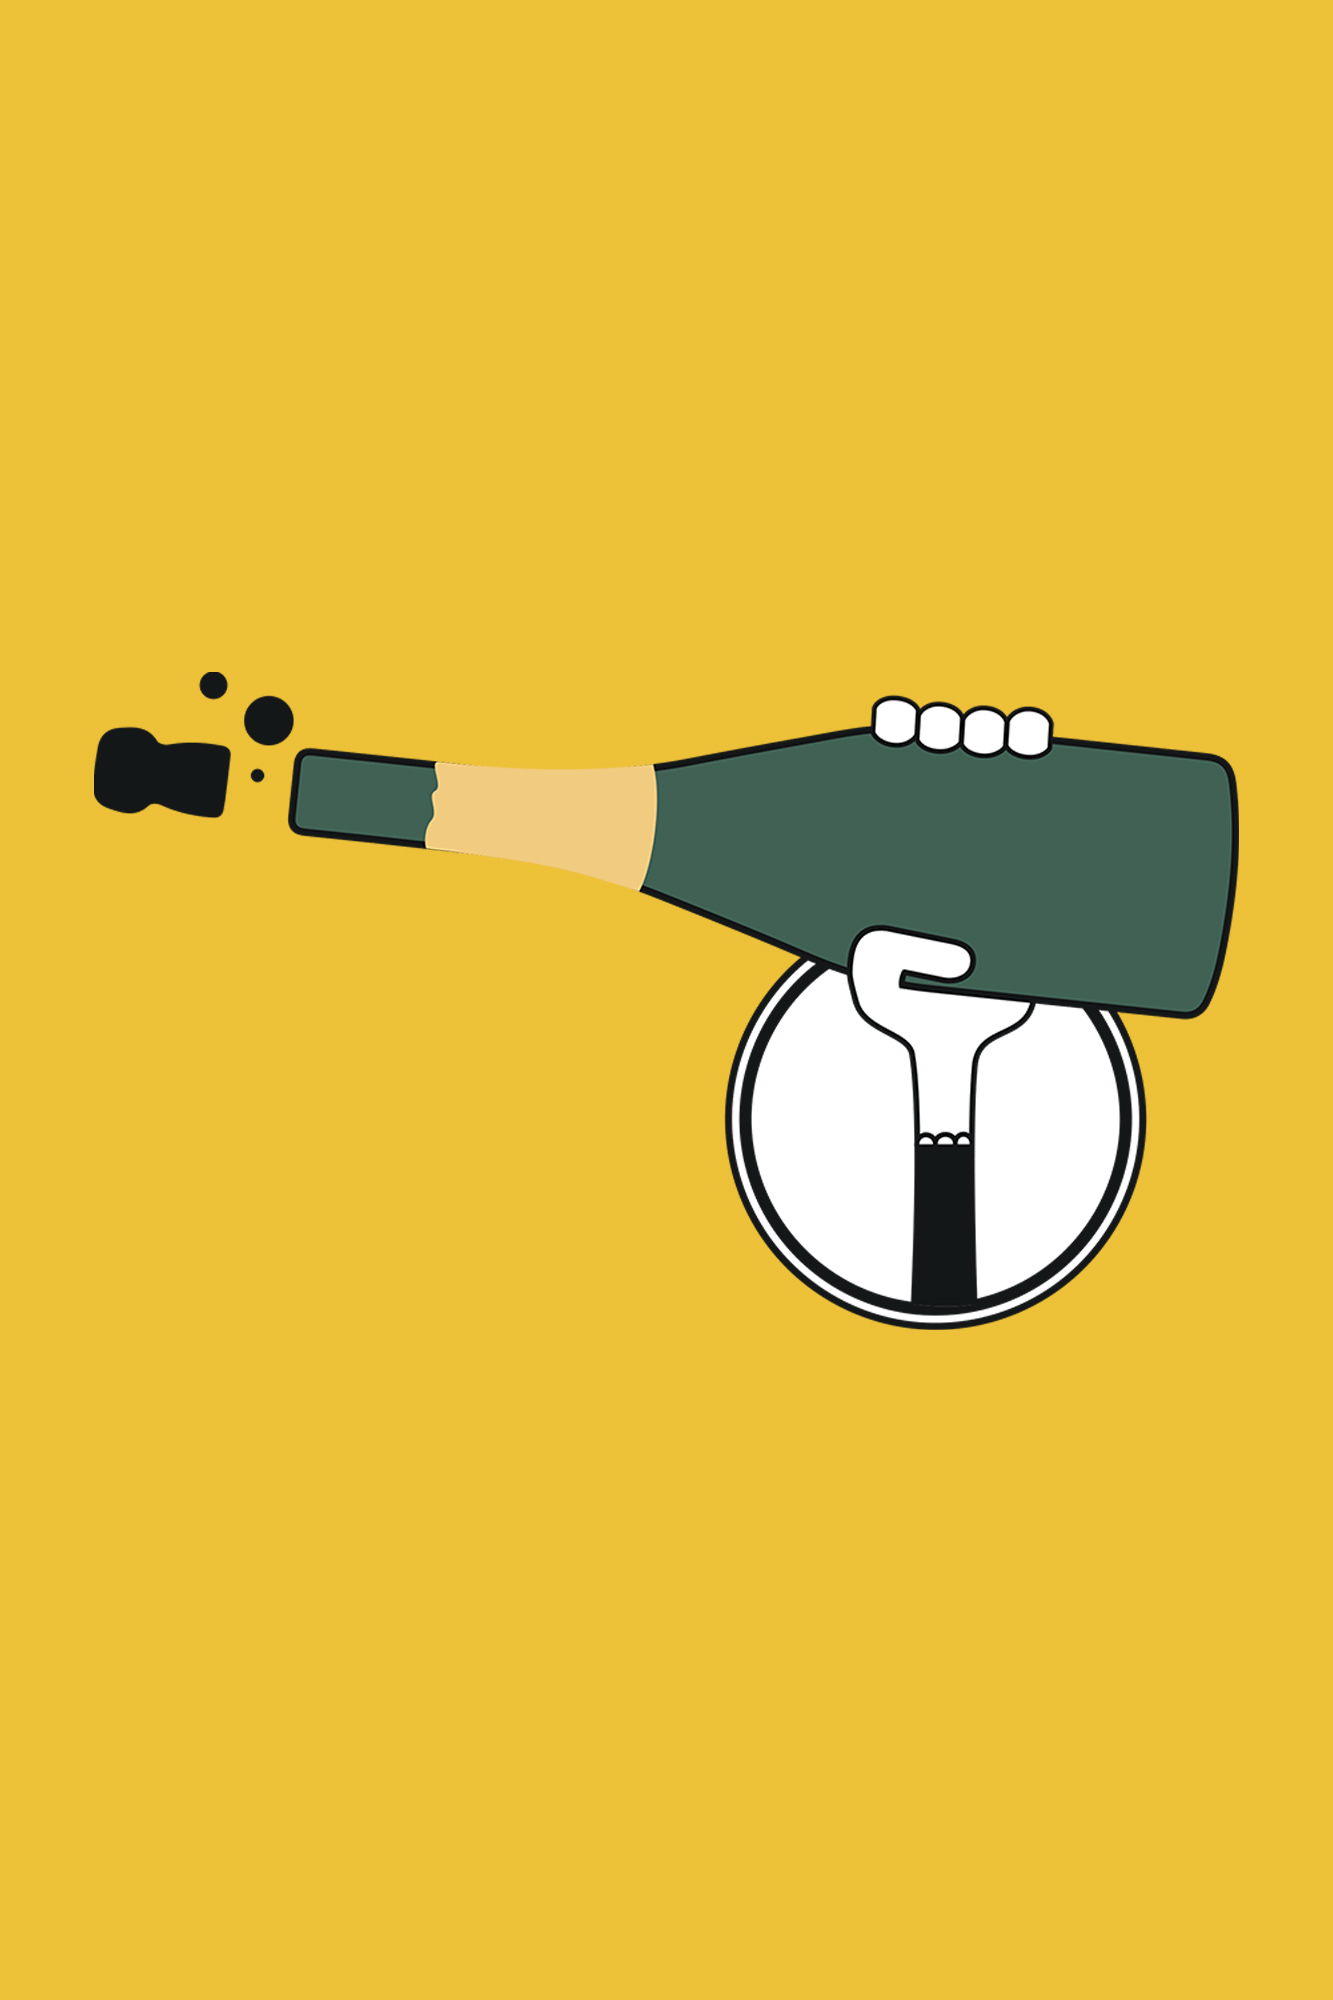 bouteille champagne femme bocavi